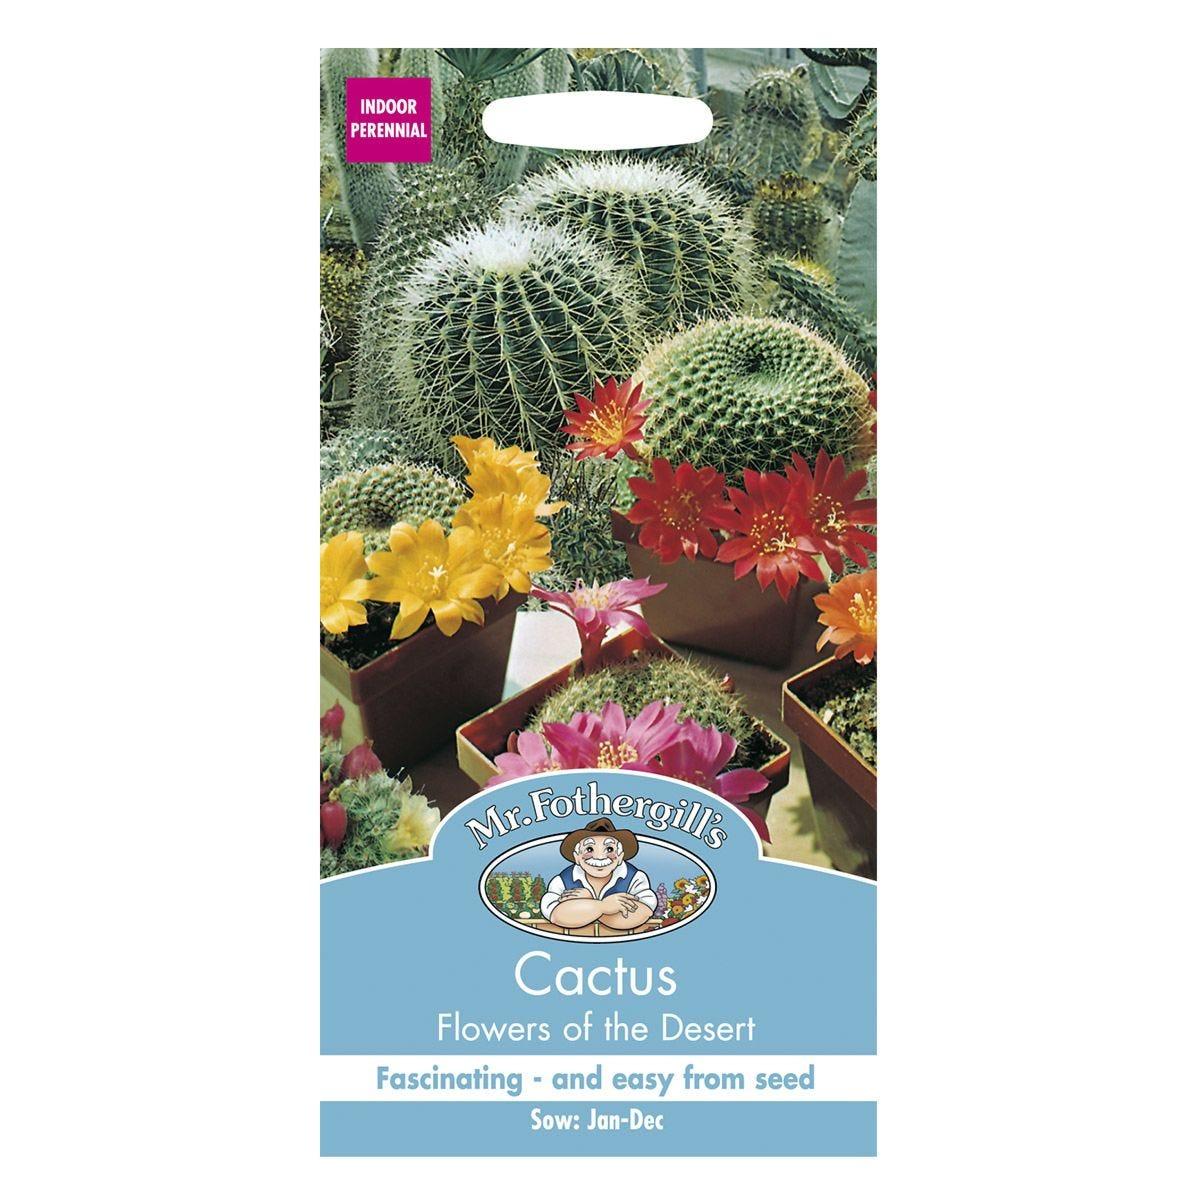 Mr Fothergill's Cactus Flowers Of The Desert Seeds